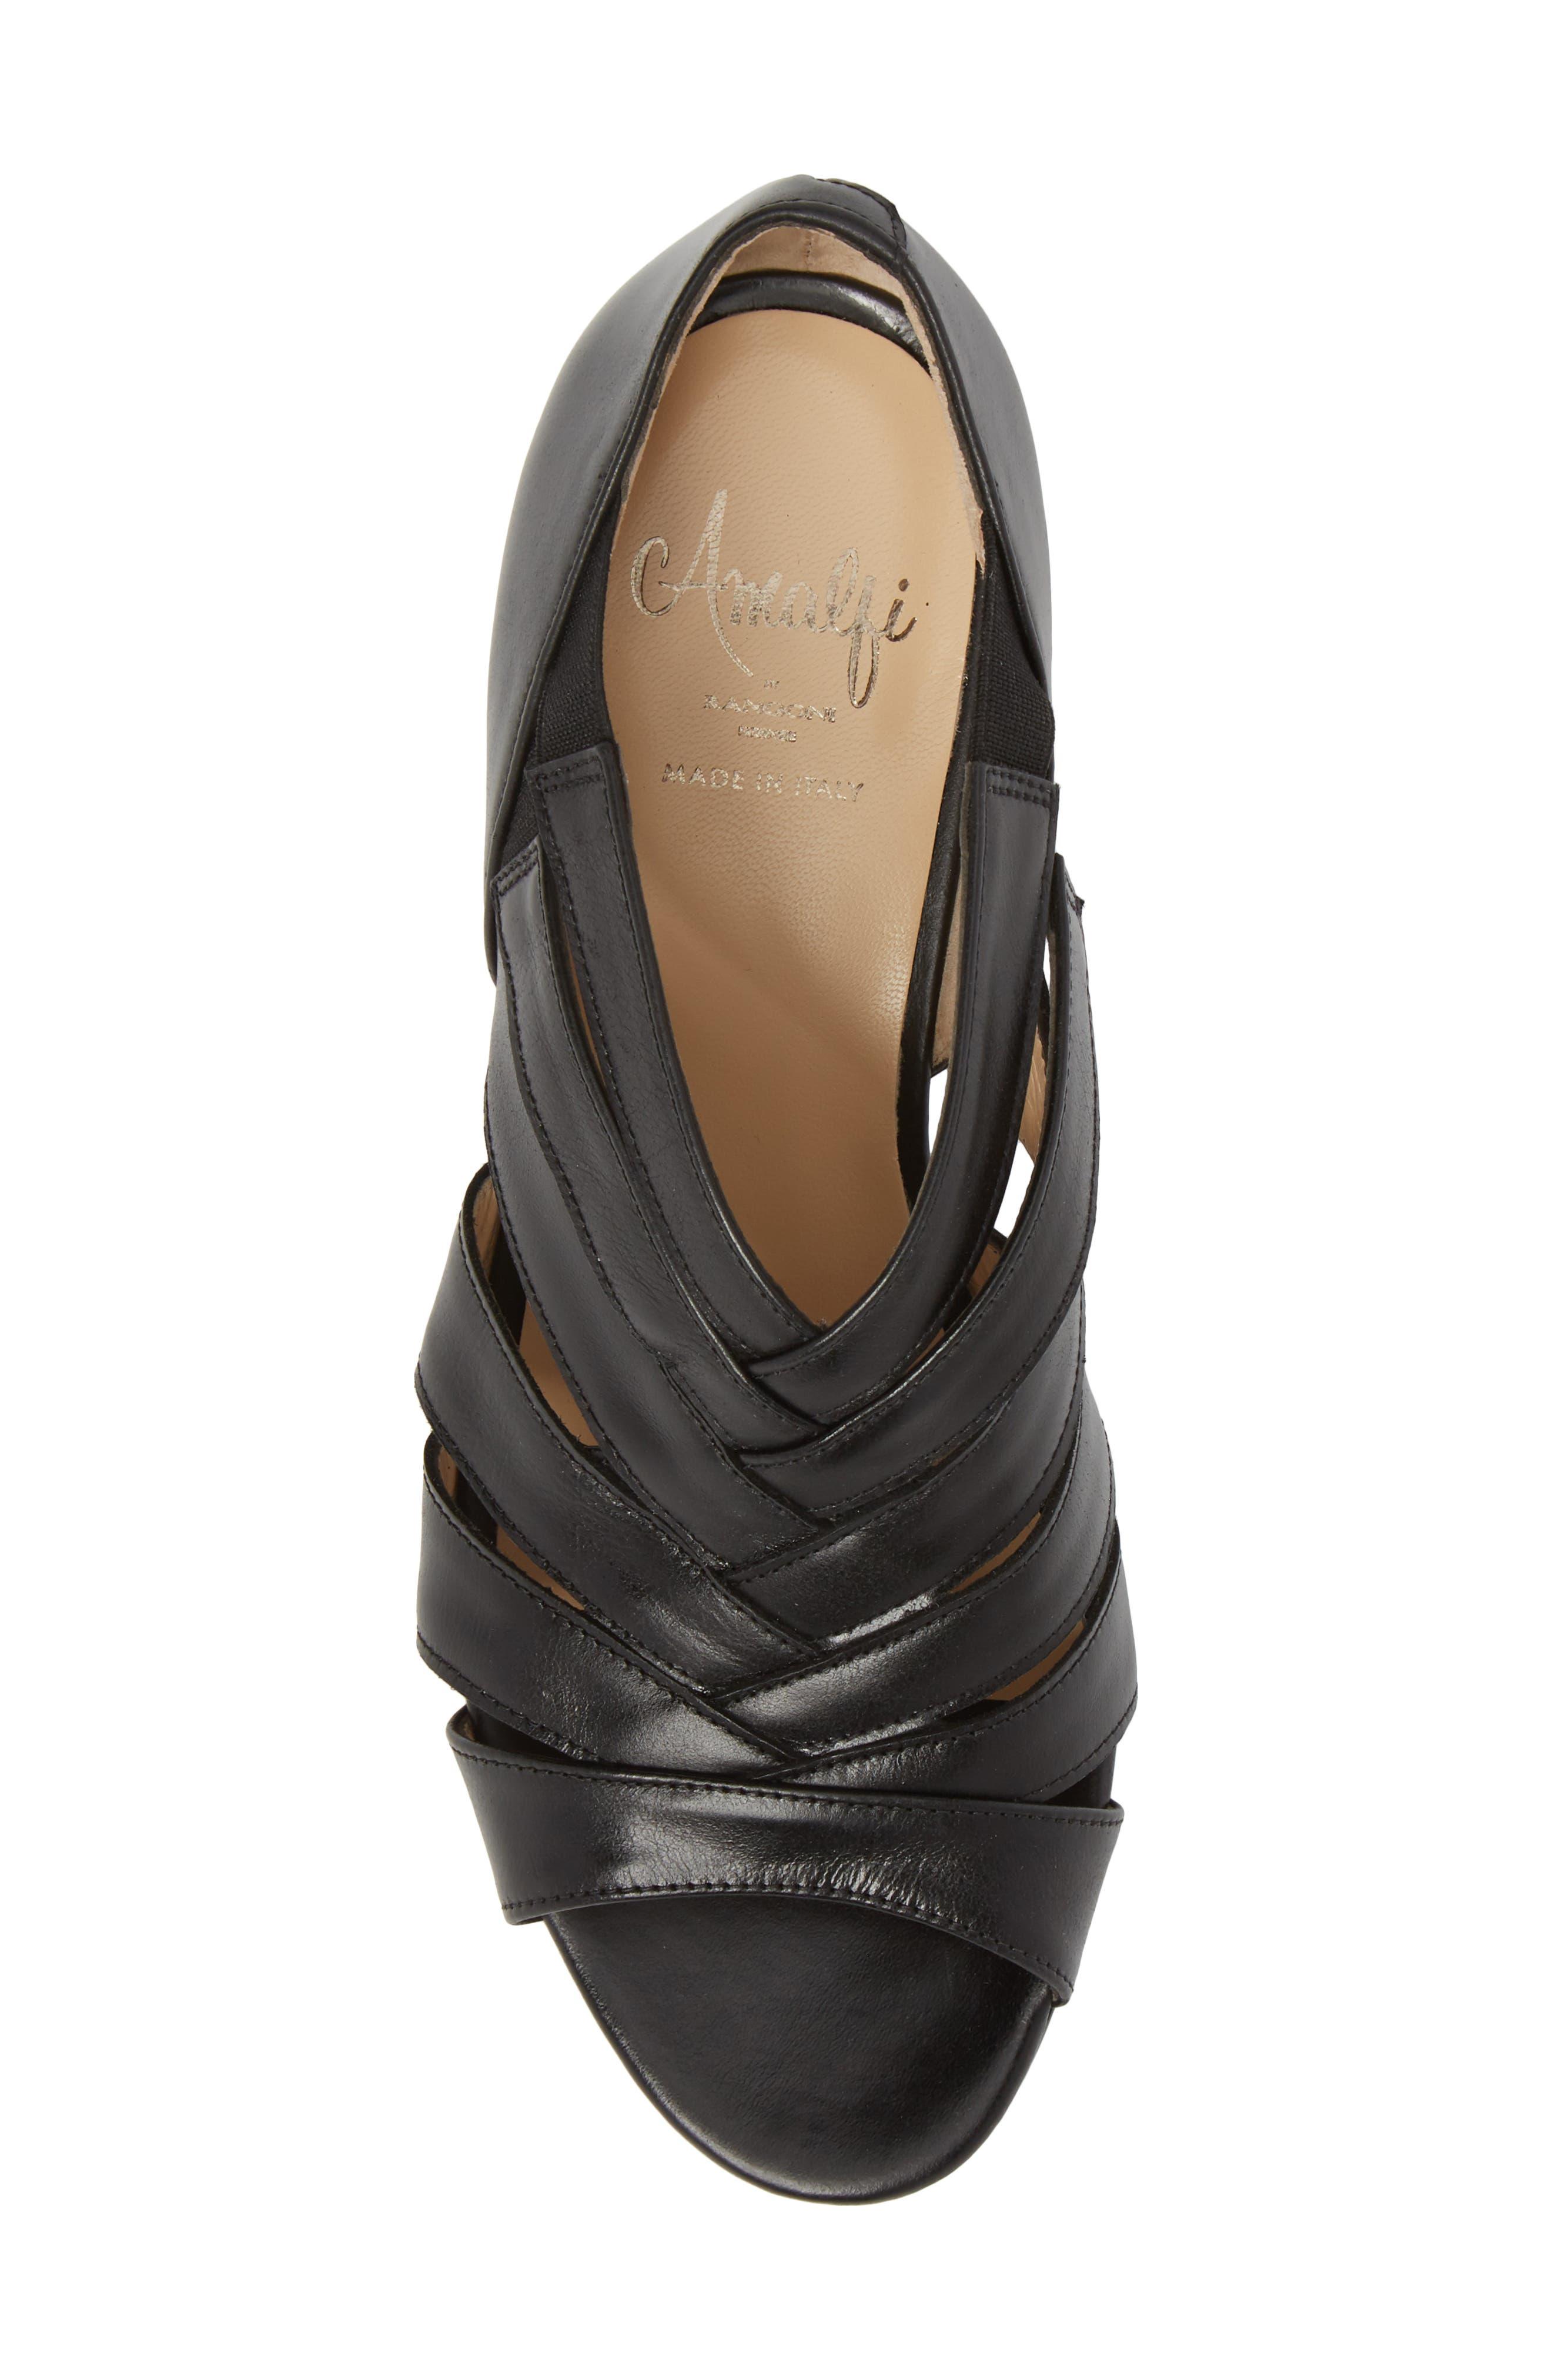 Demetra Sandal,                             Alternate thumbnail 5, color,                             Black Leather